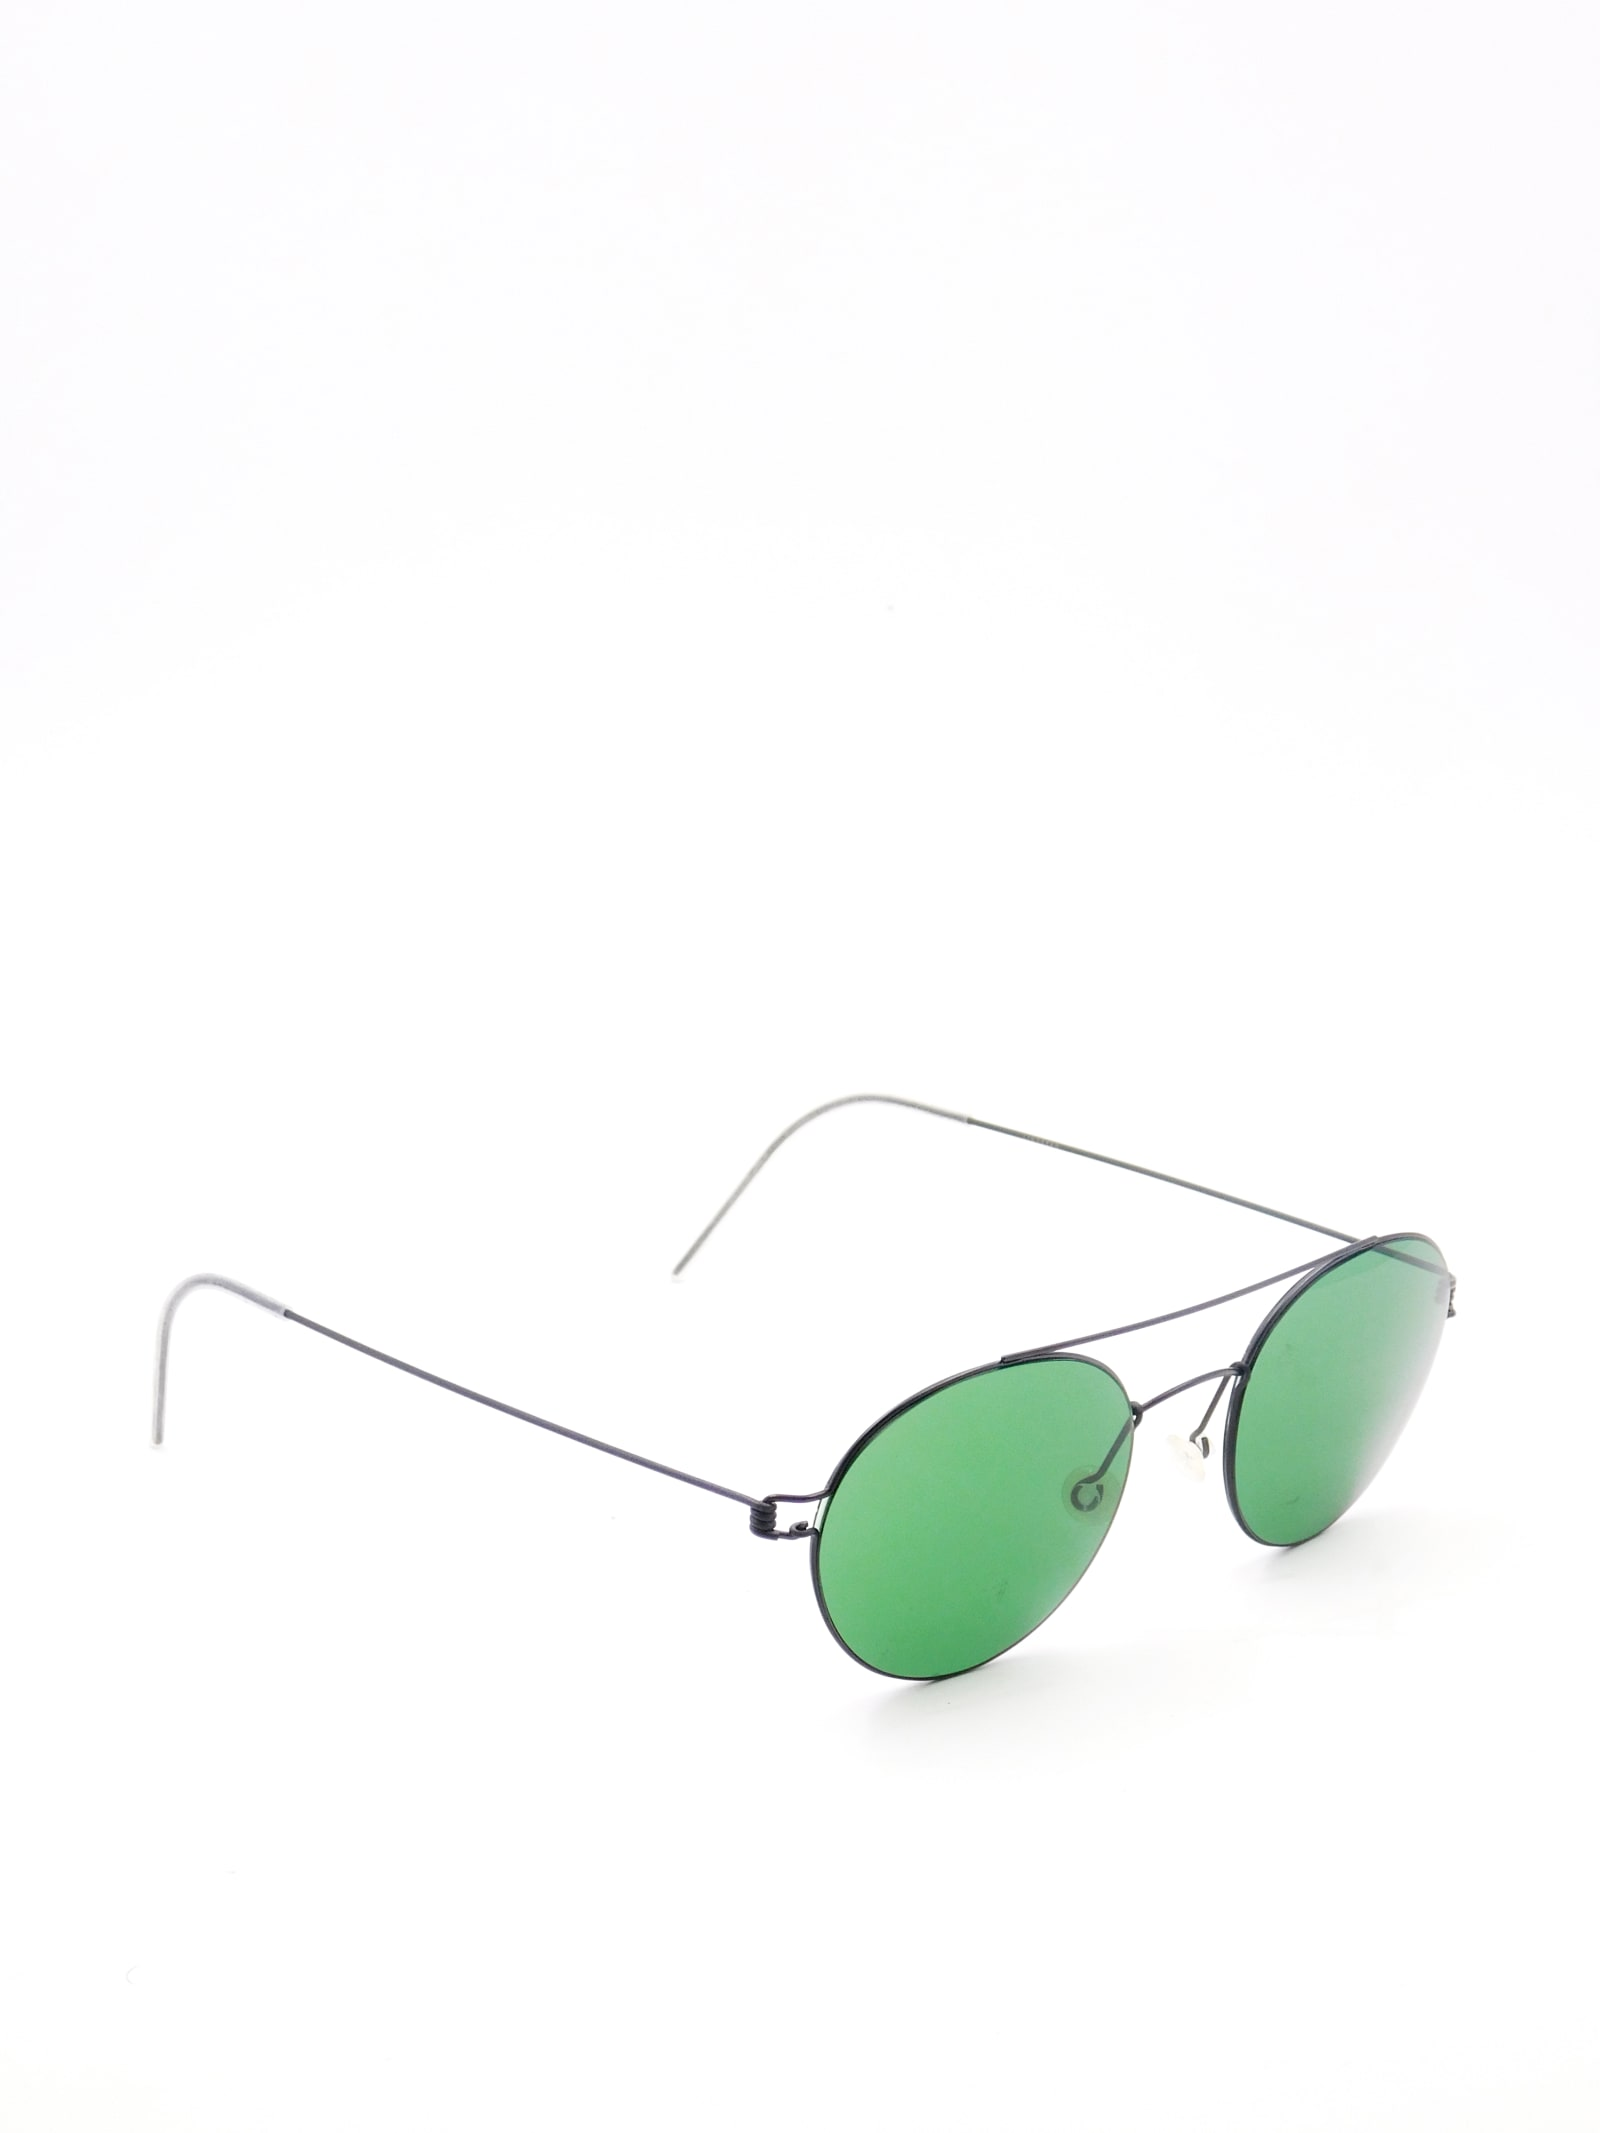 LINDBERG 8201 Eyewear